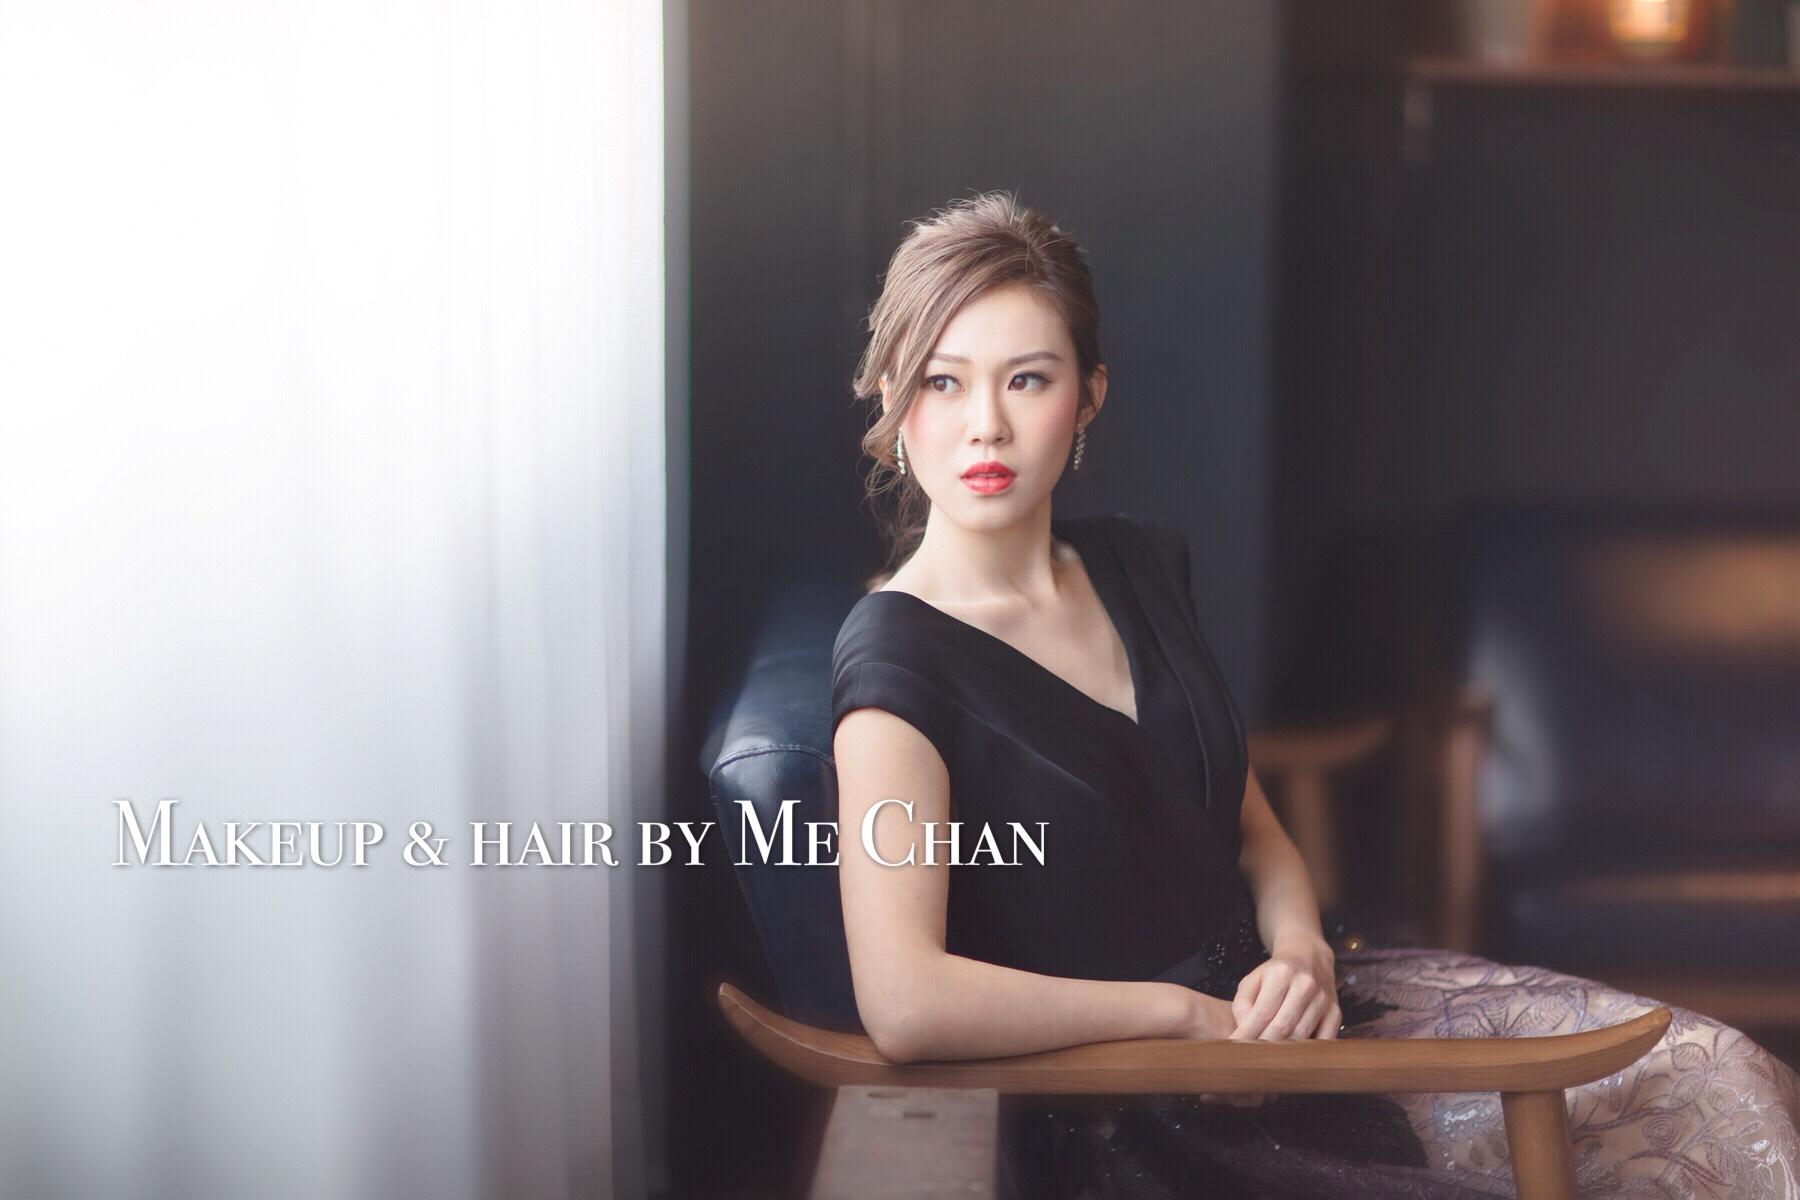 MAKB KEUP& HAIR BY MIE CHAN,photograph,beauty,lady,shoulder,girl